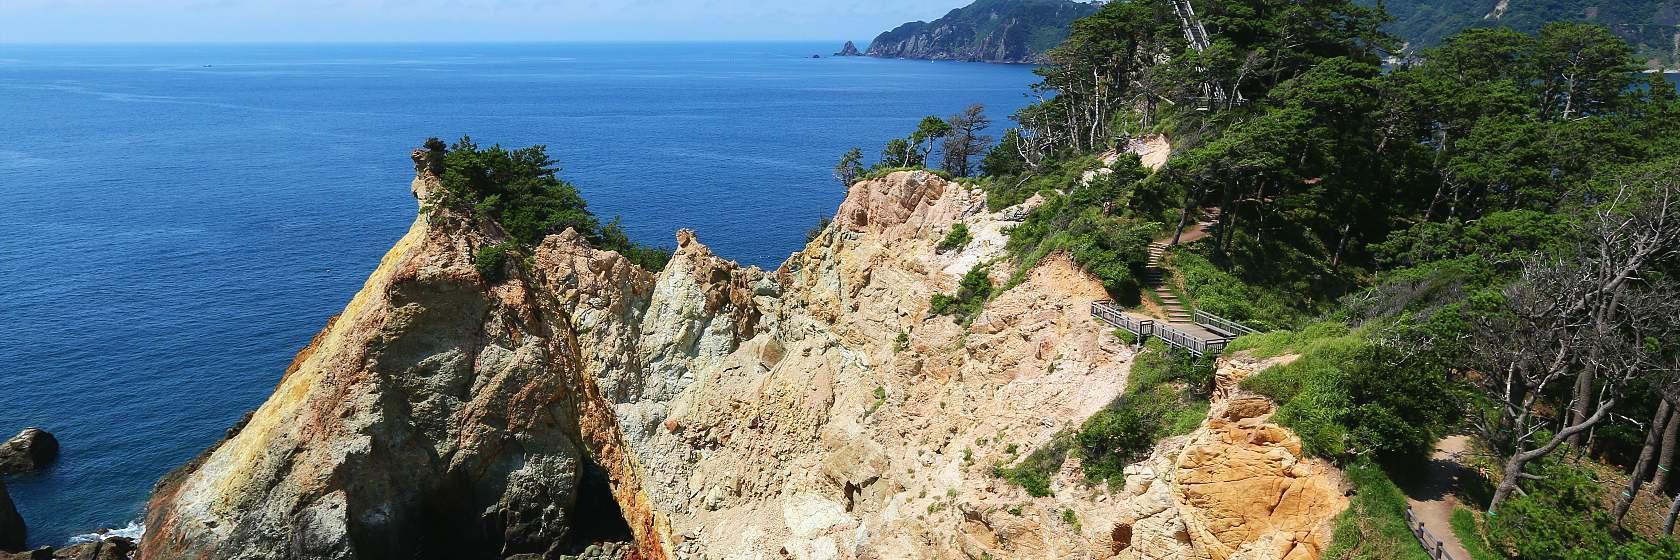 Izu Peninsula (Izu Hanto) Trav...